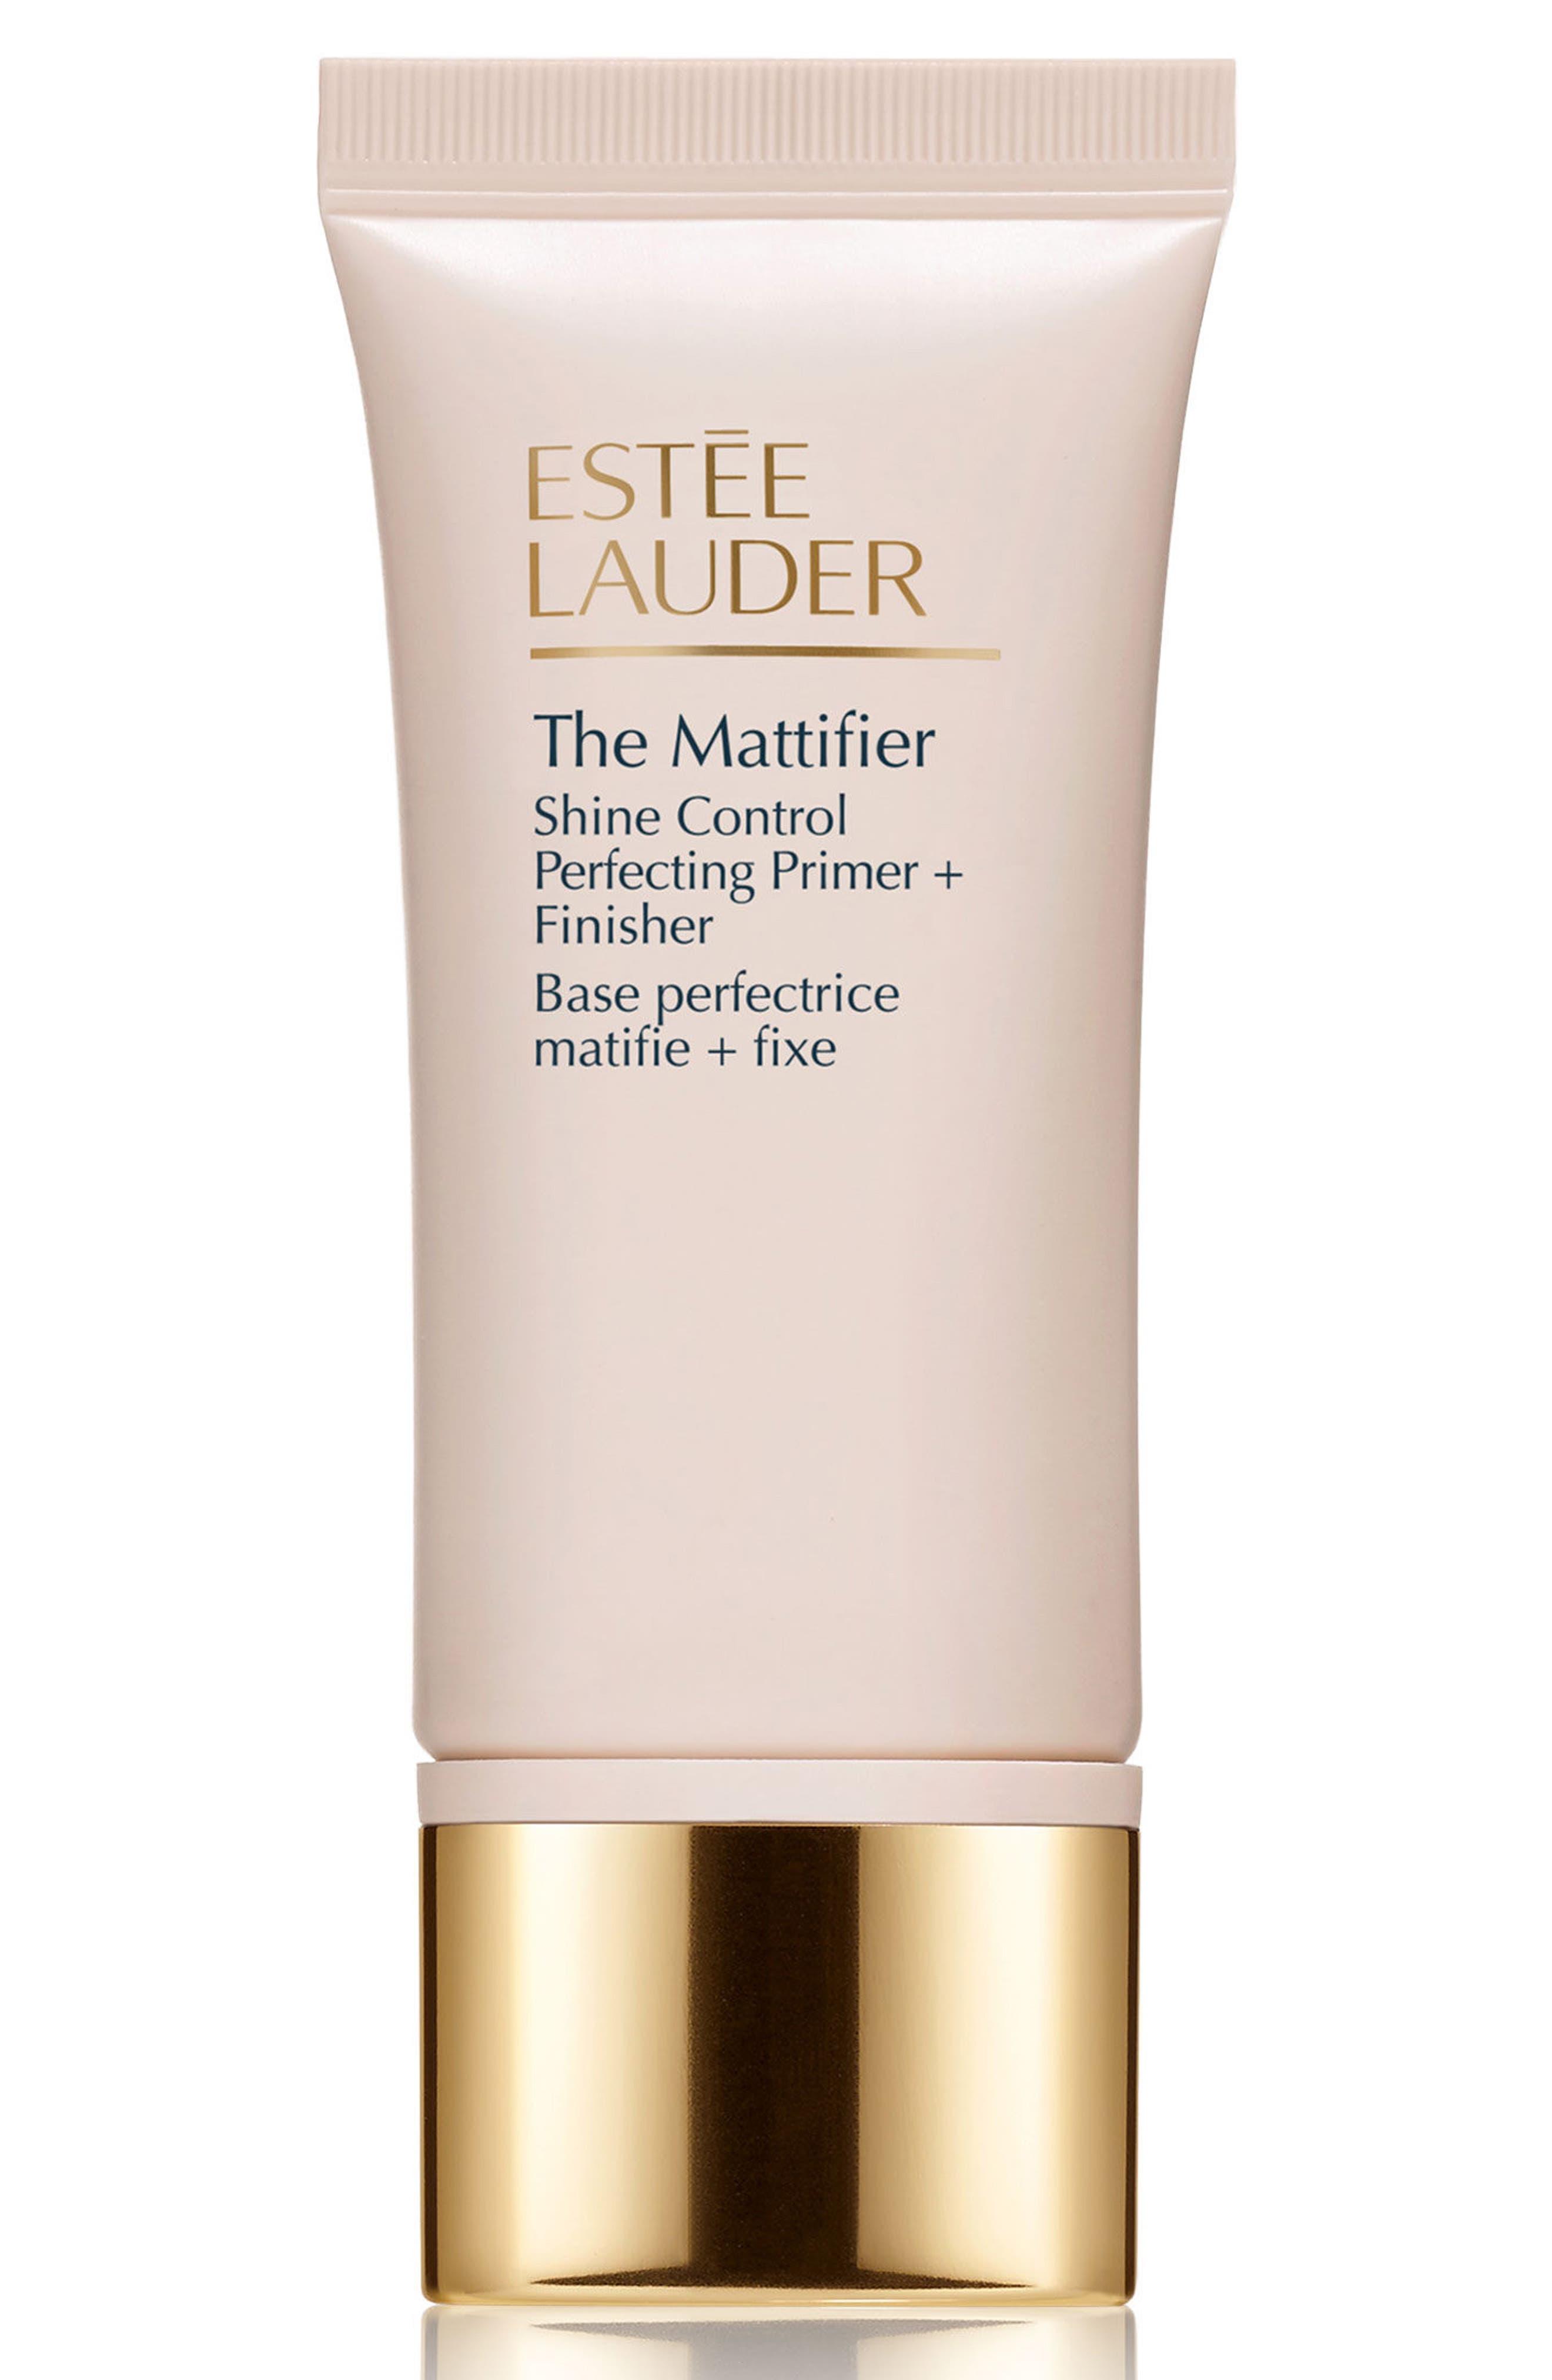 The Mattifier Shine Control Perfecting Primer + Finish